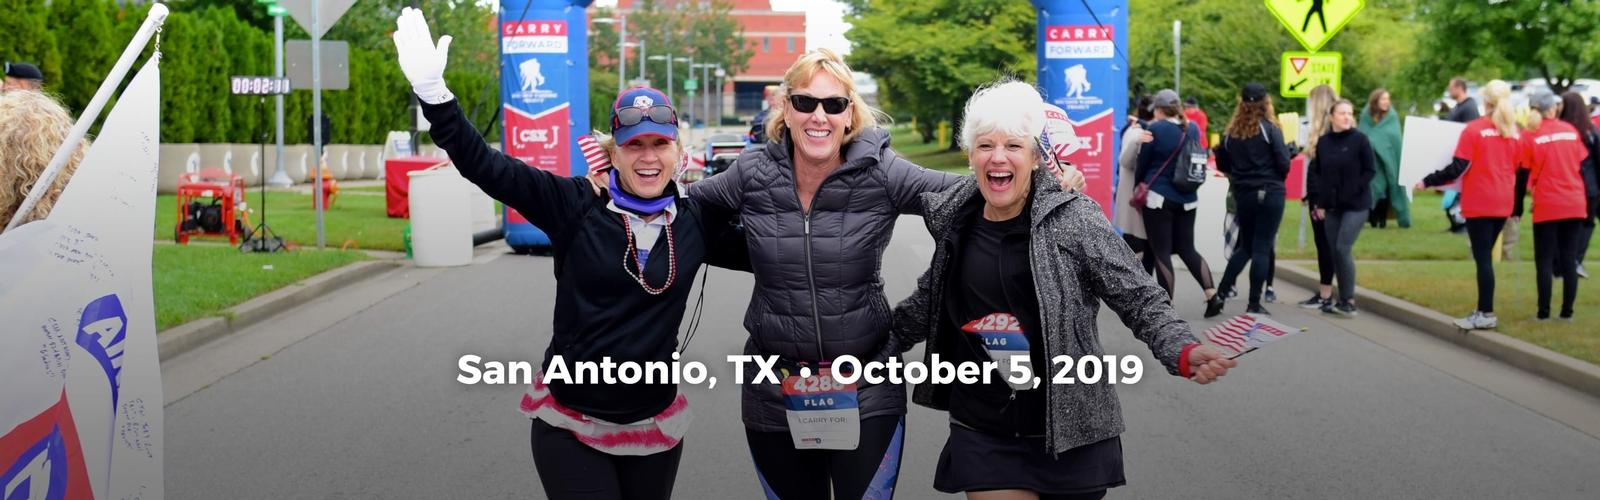 Carry Forward 174 5k Run Walk San Antonio Wwp